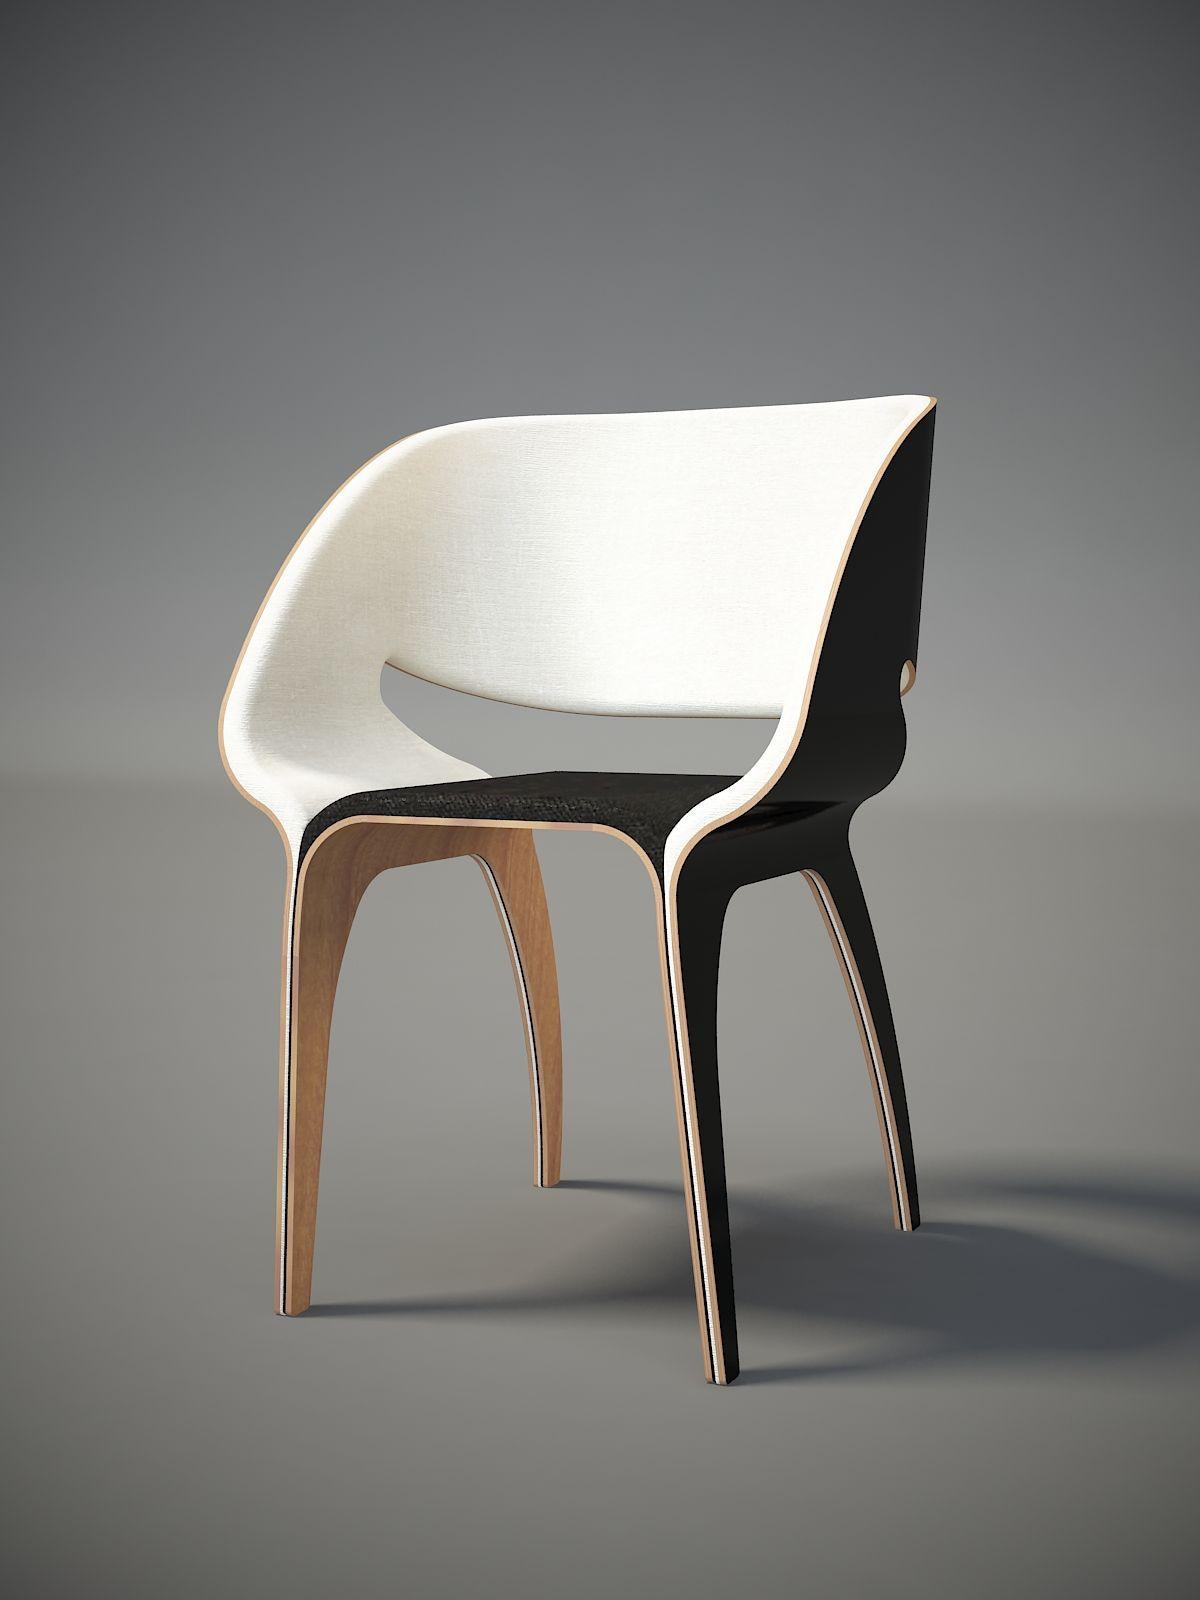 si chair concept furniture pinterest. Black Bedroom Furniture Sets. Home Design Ideas